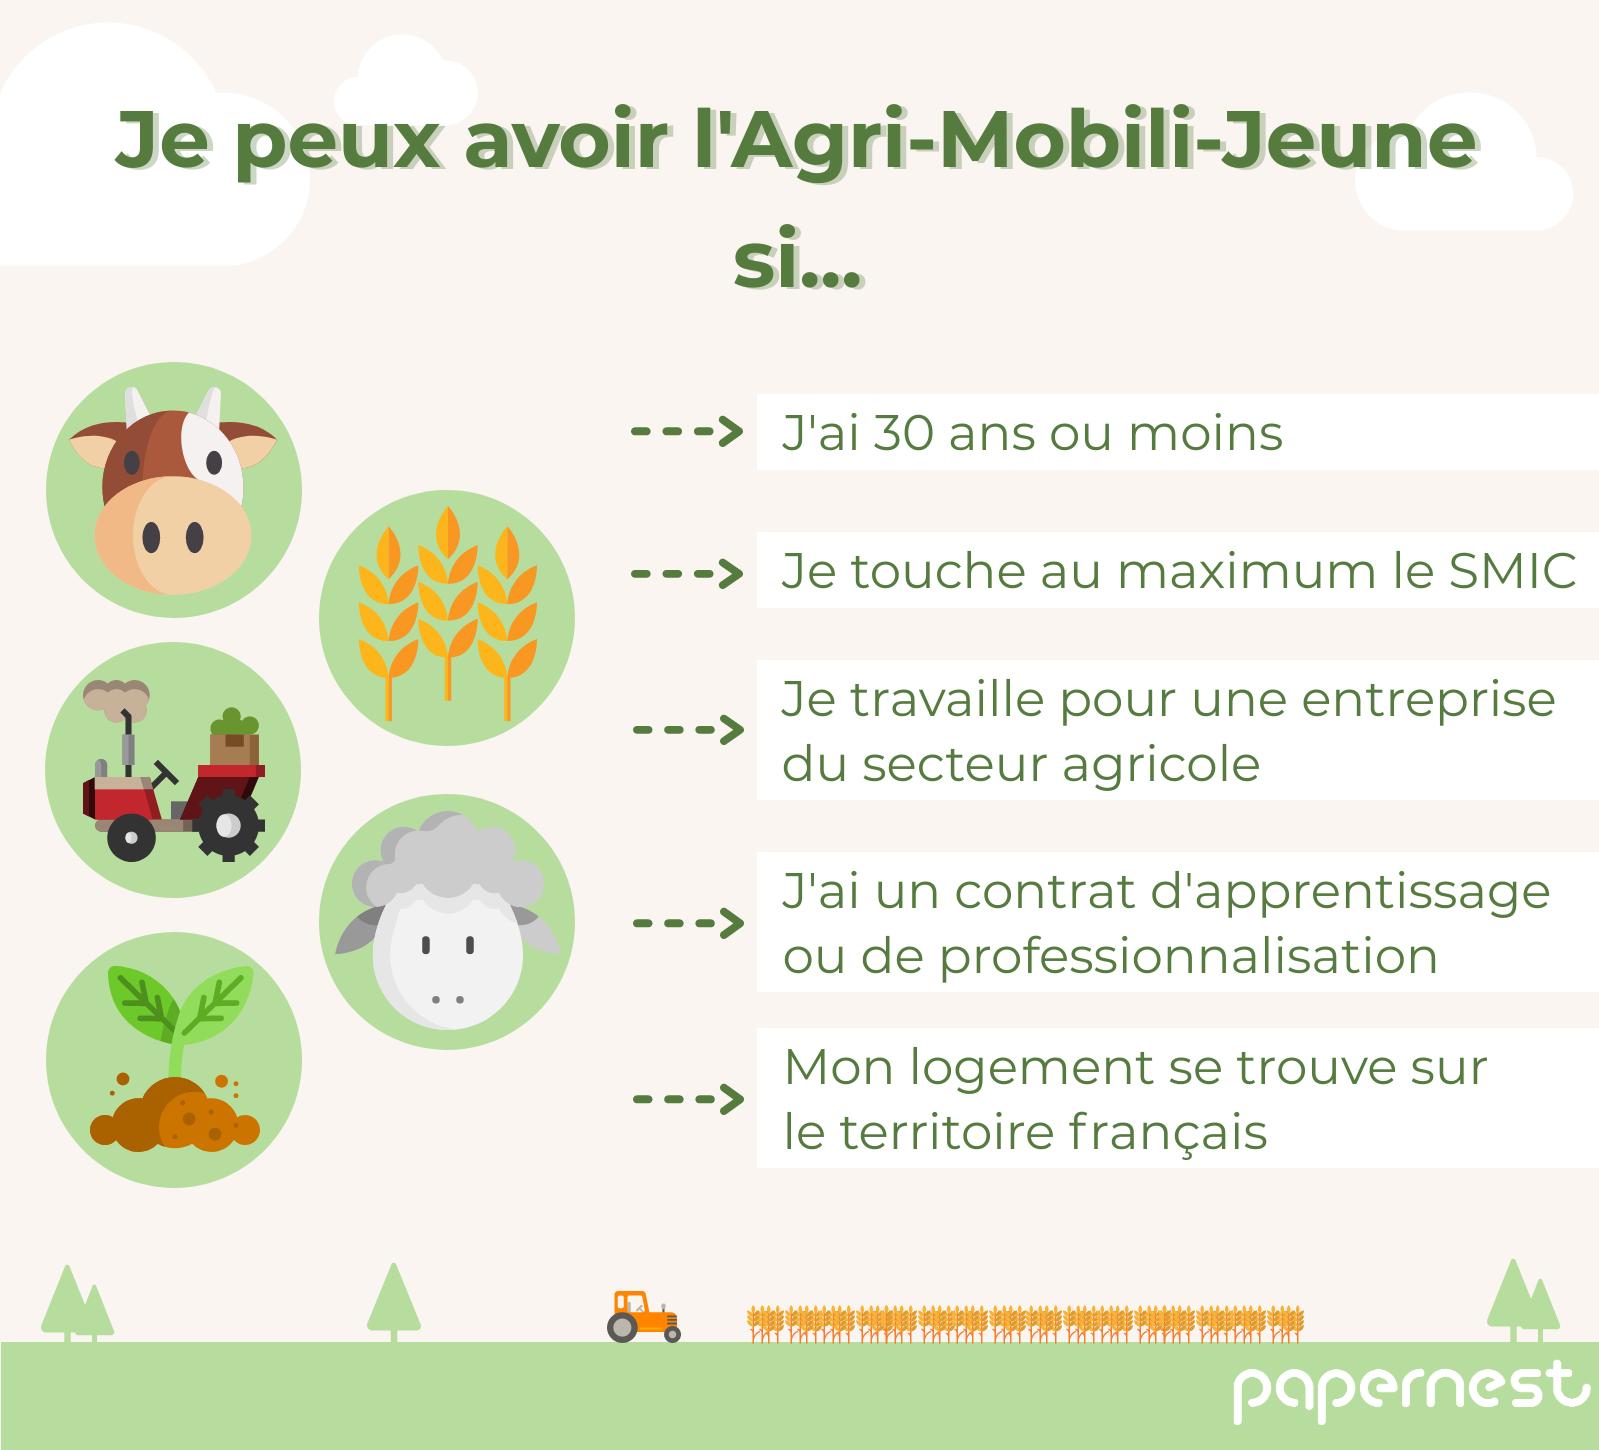 Éligibilité Agri-Mobili-Jeune